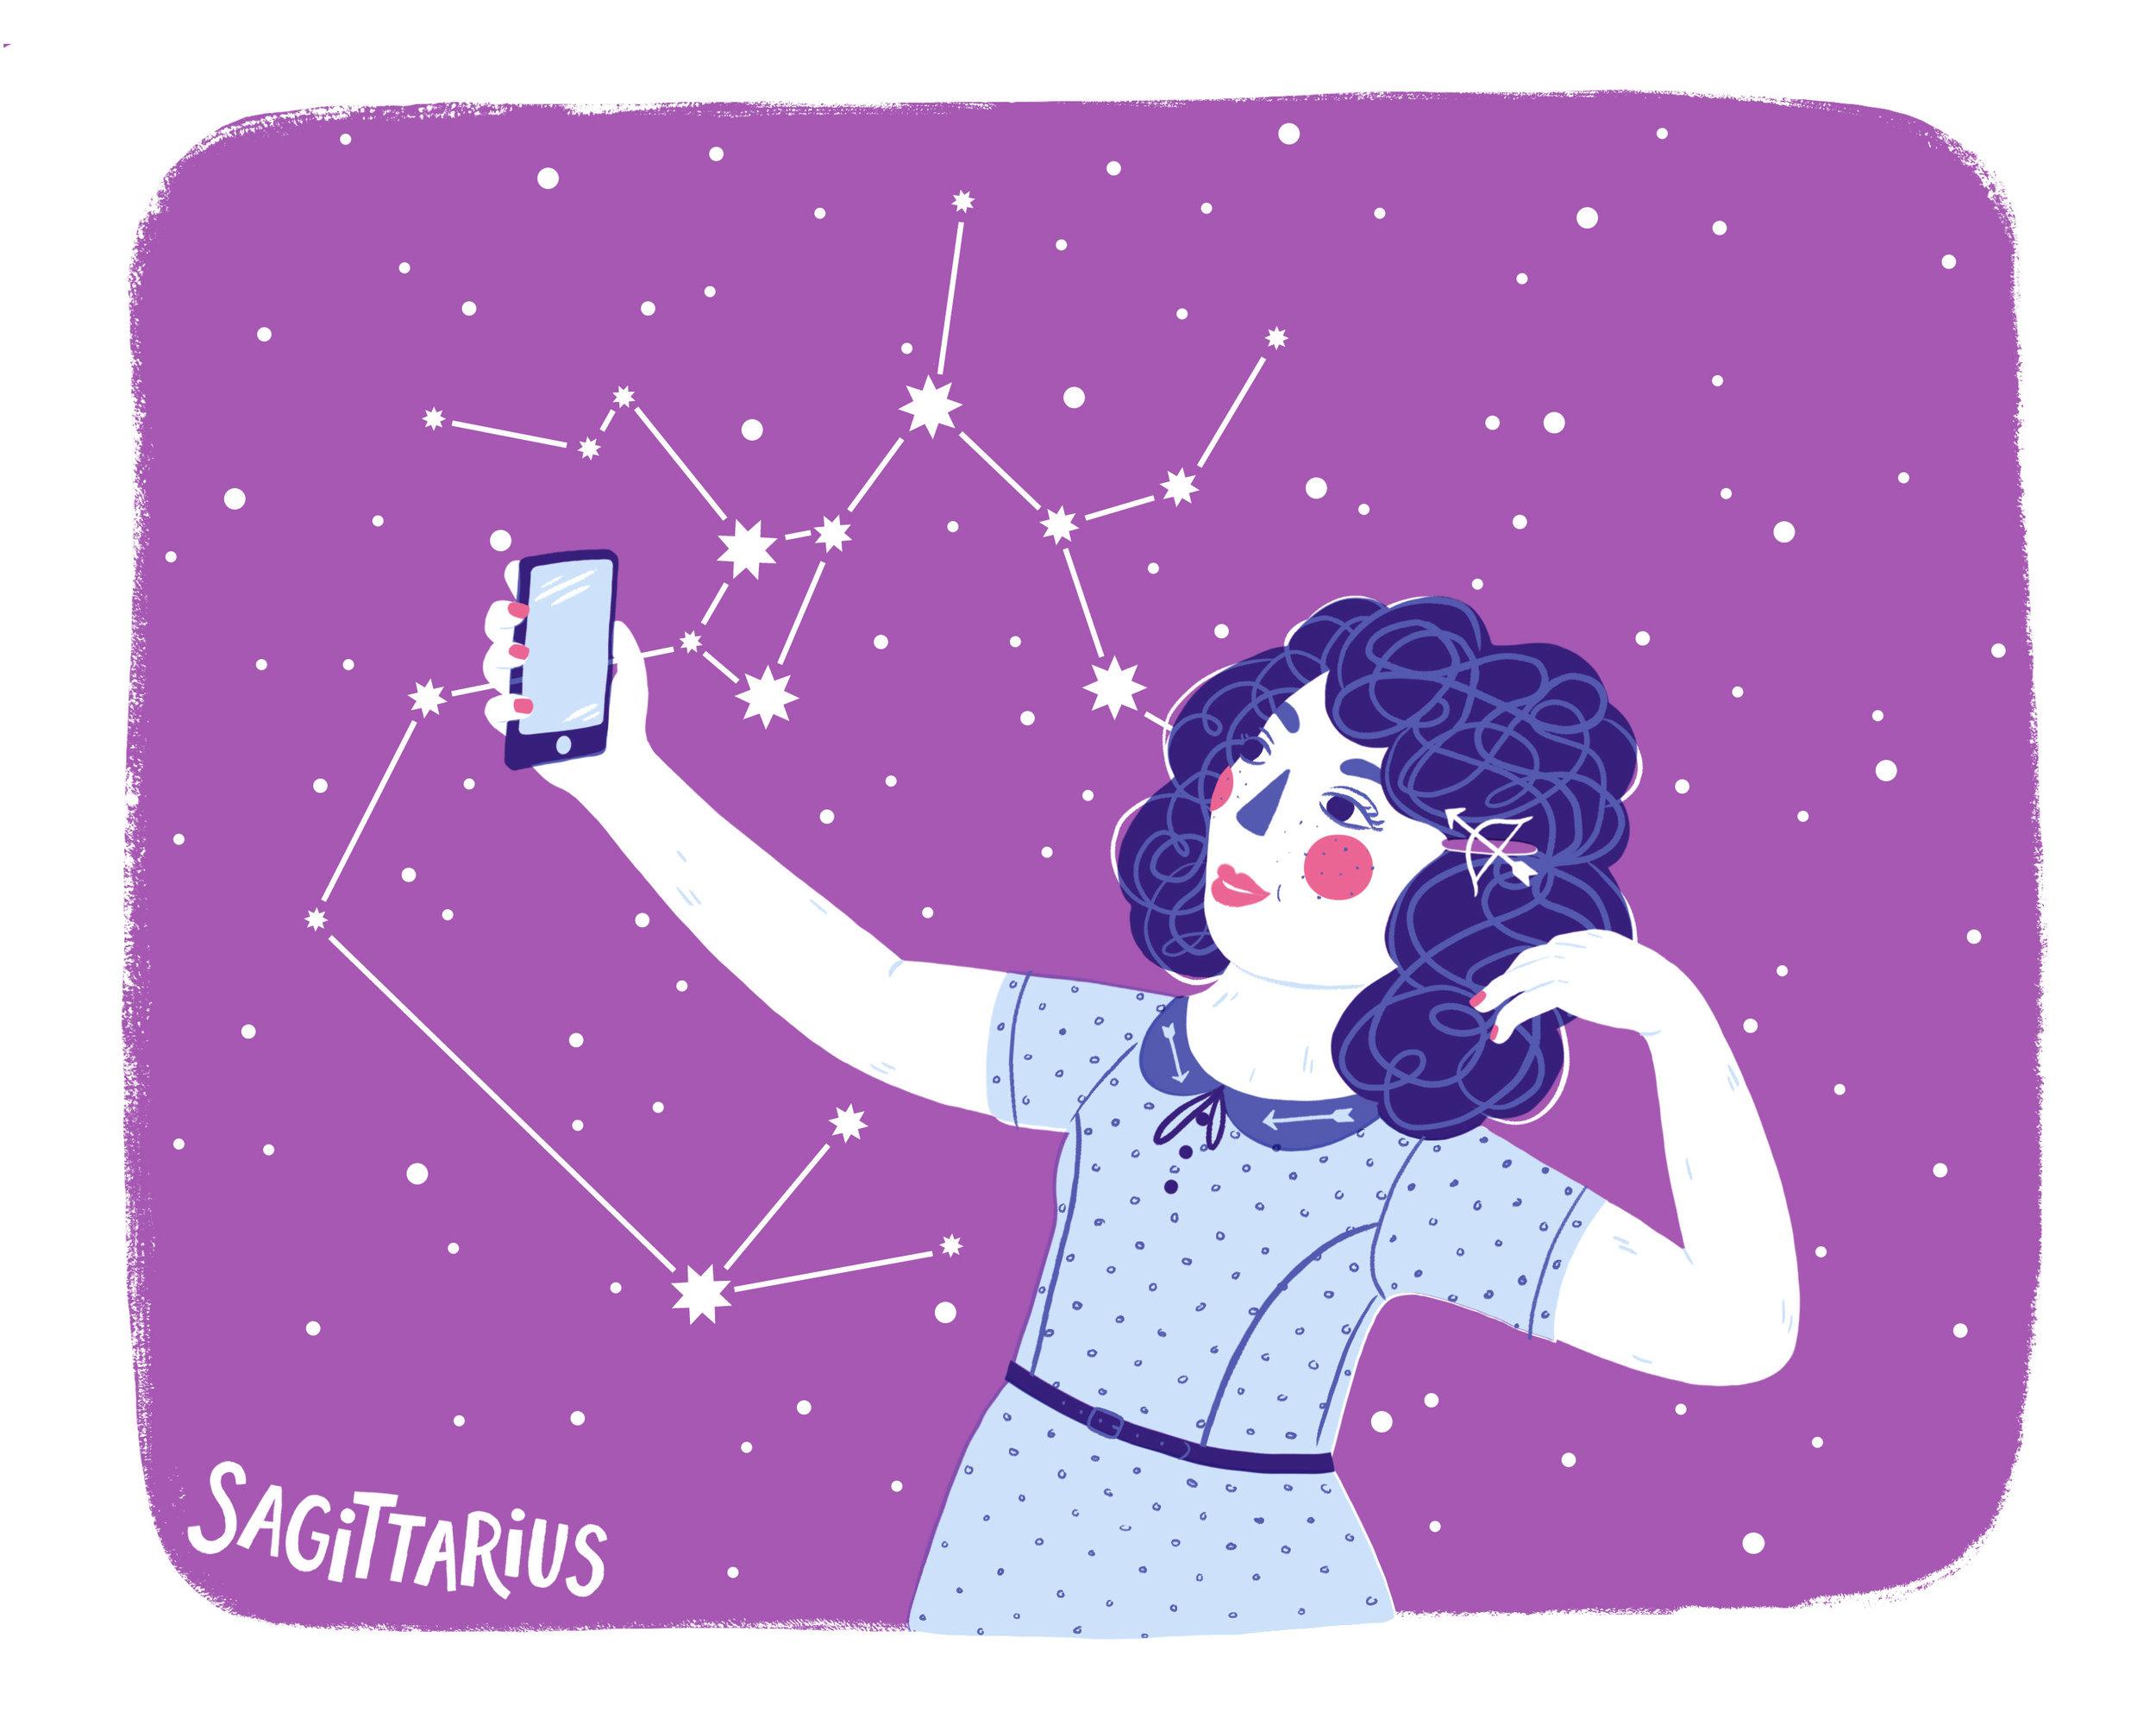 sagittarius10a.jpg